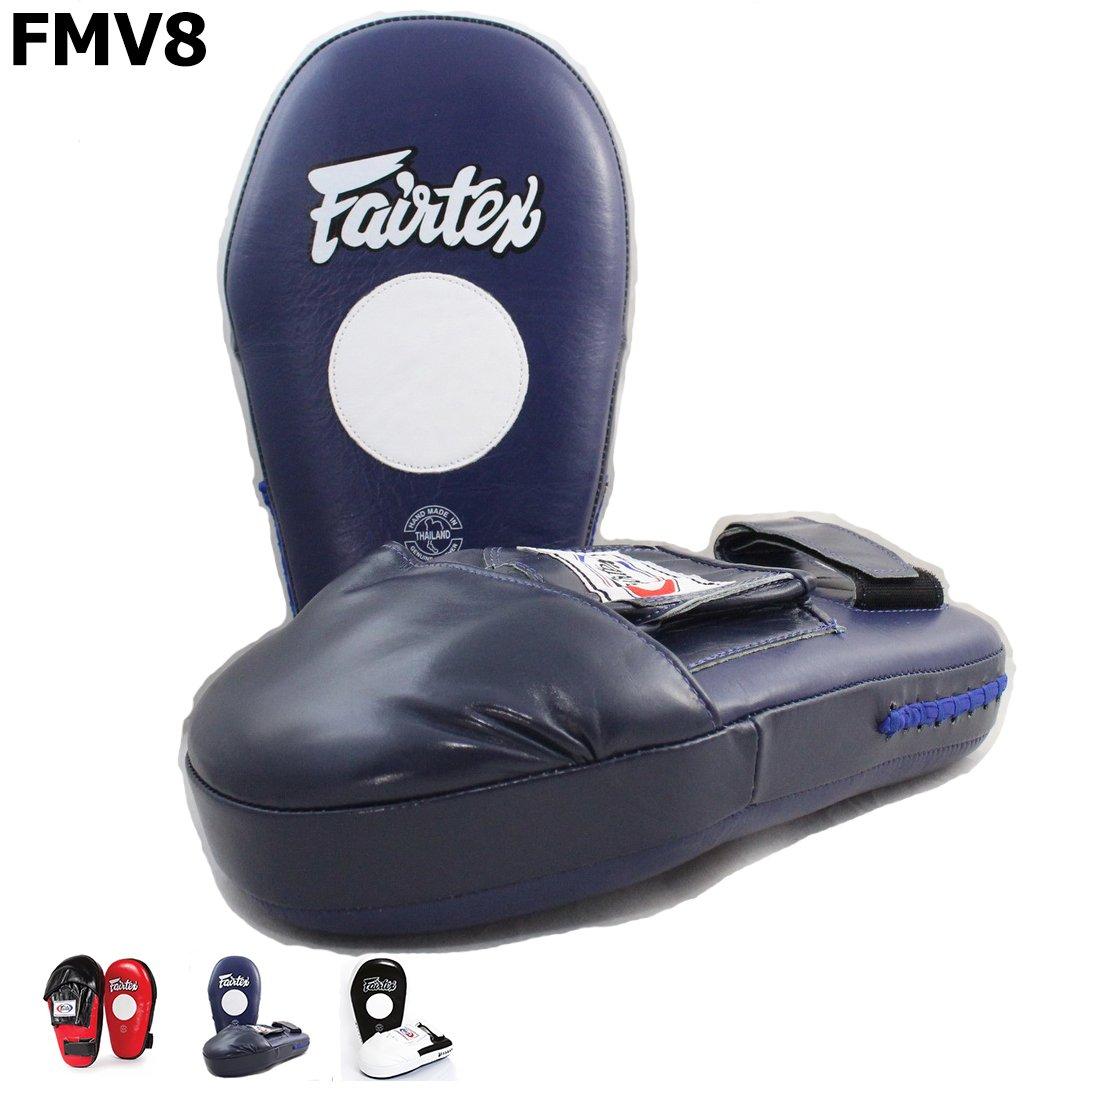 【2018A/W新作★送料無料】 Fairtex fmv8 ブルー Pro Angular fmv8 Angular Focus Mitts Punchingトレーニングタイ式ボクシング ブルー B06XFV93LM, ナチュラル美健:bc41ee04 --- a0267596.xsph.ru